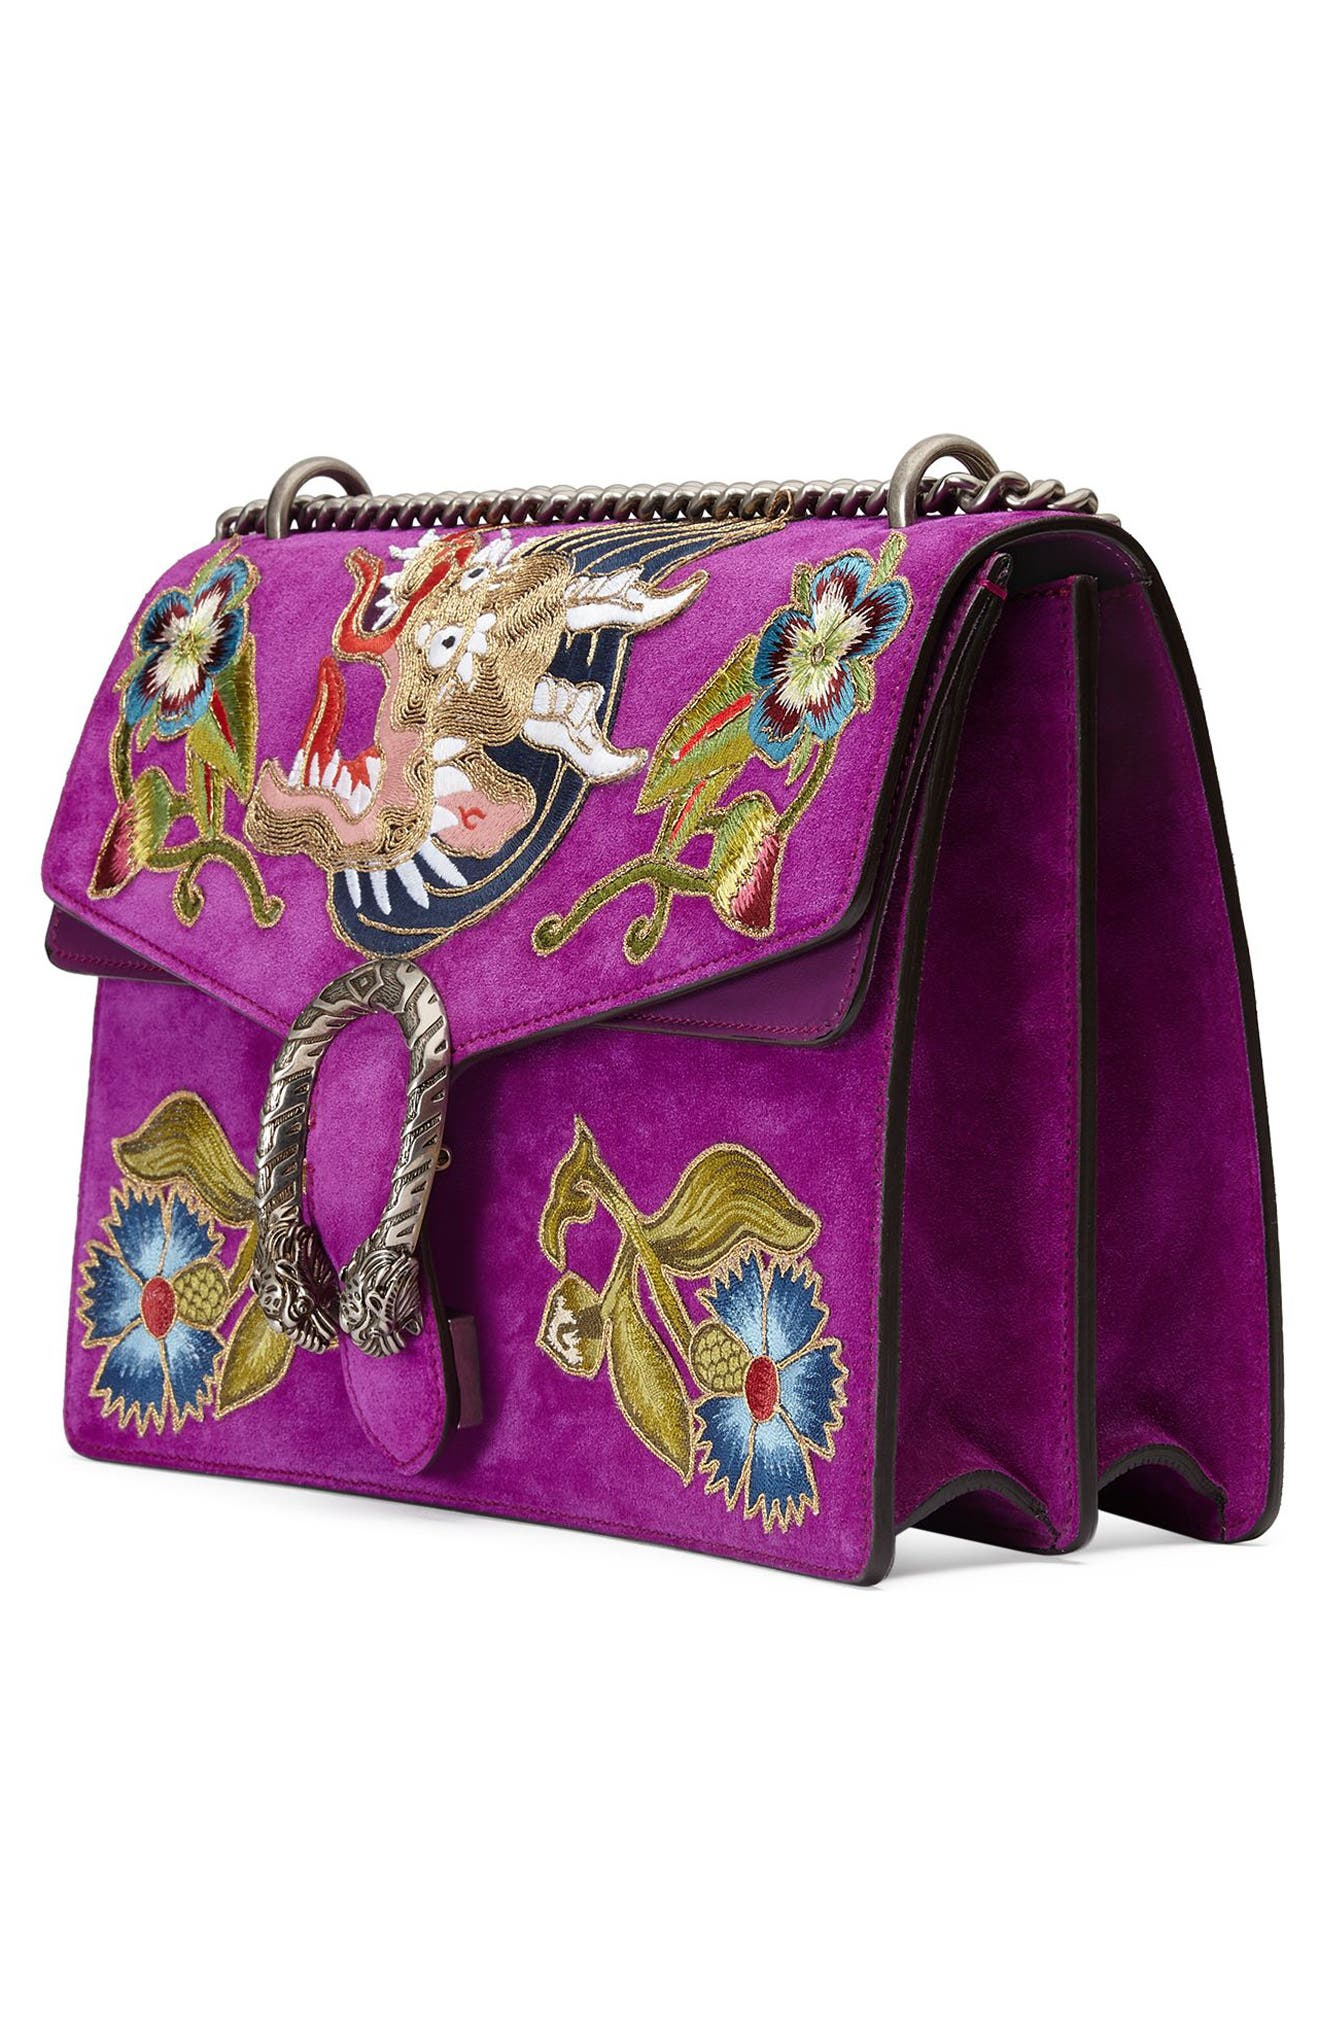 Dionysus Suede Shoulder Bag,                             Alternate thumbnail 4, color,                             PURPLE/MULTI